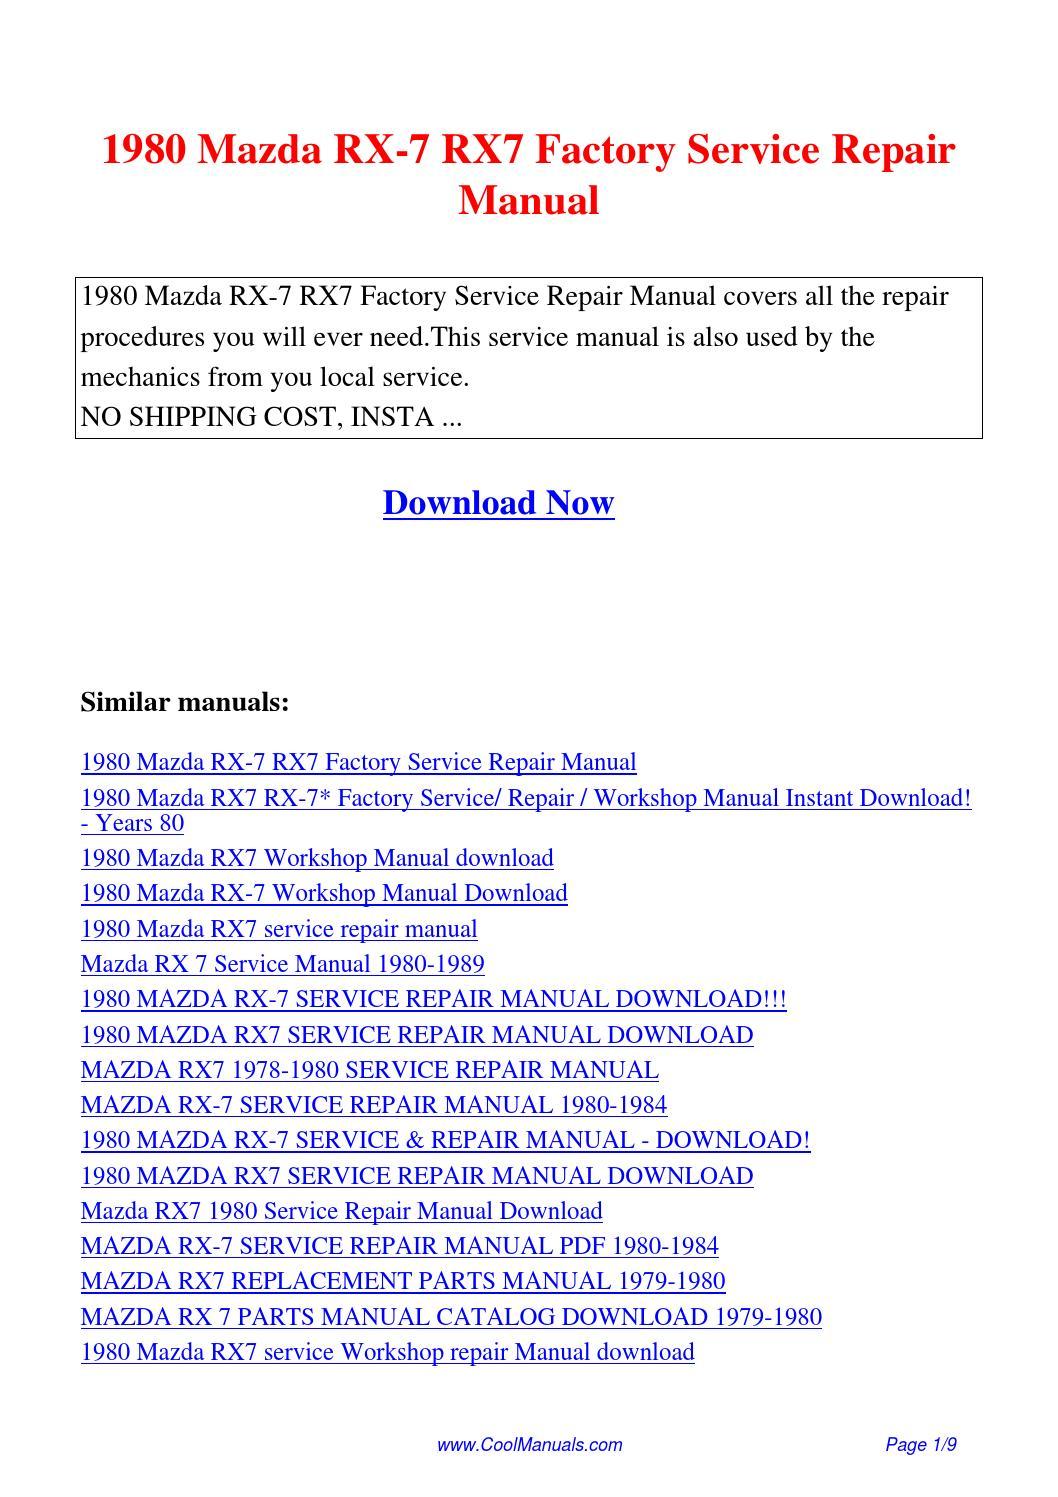 1980 Mazda RX-7 RX7 Factory Service Repair Manual.pdf by Guang Hui - issuu